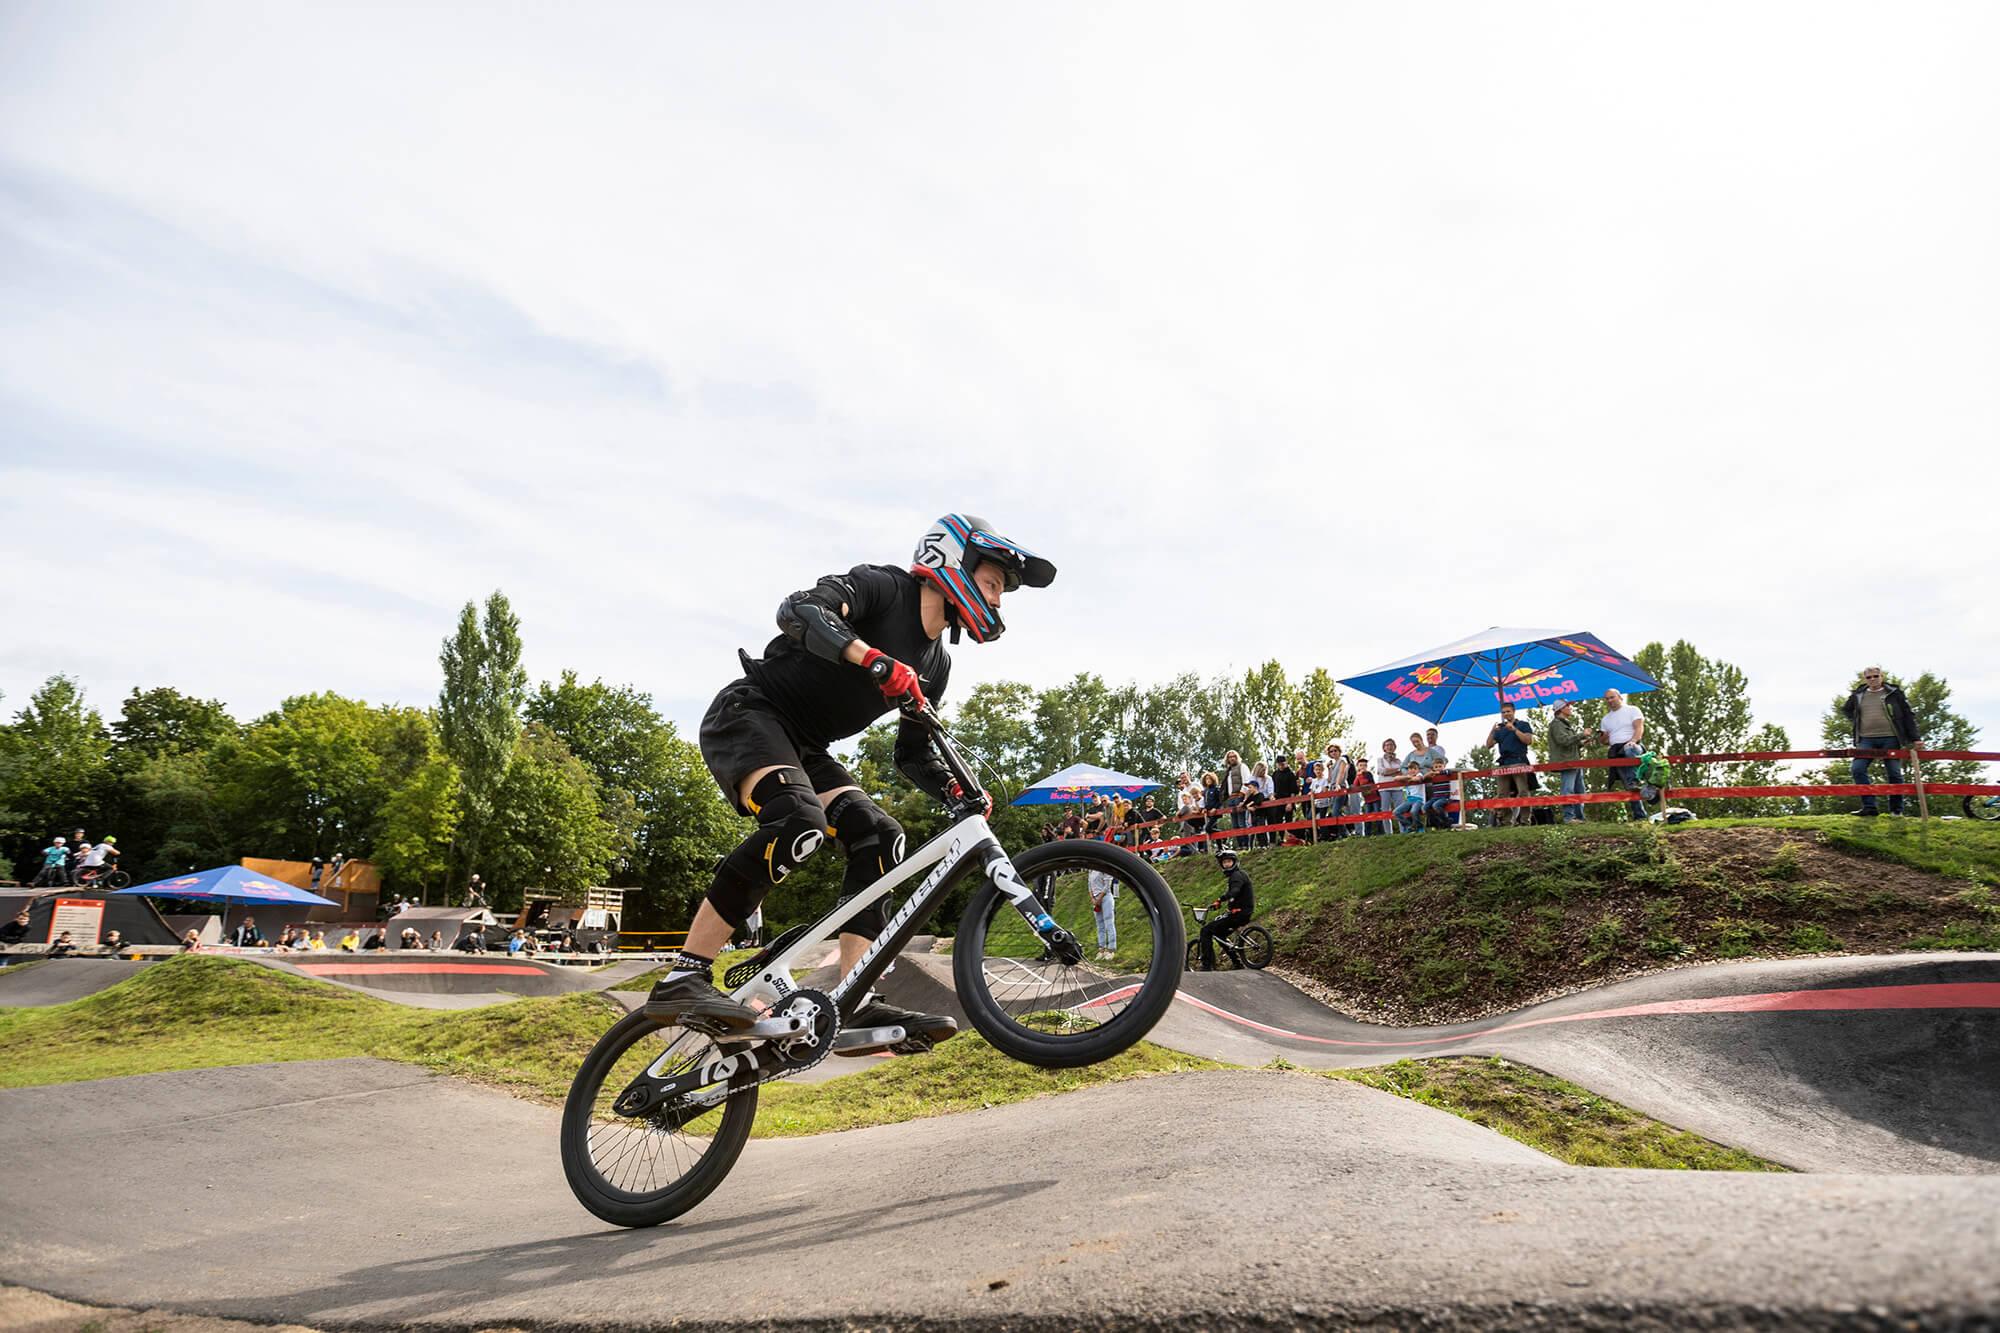 Red Bull Pump Track Qualifier Mellowpark Aug 2021 - Thomas Dietze -292